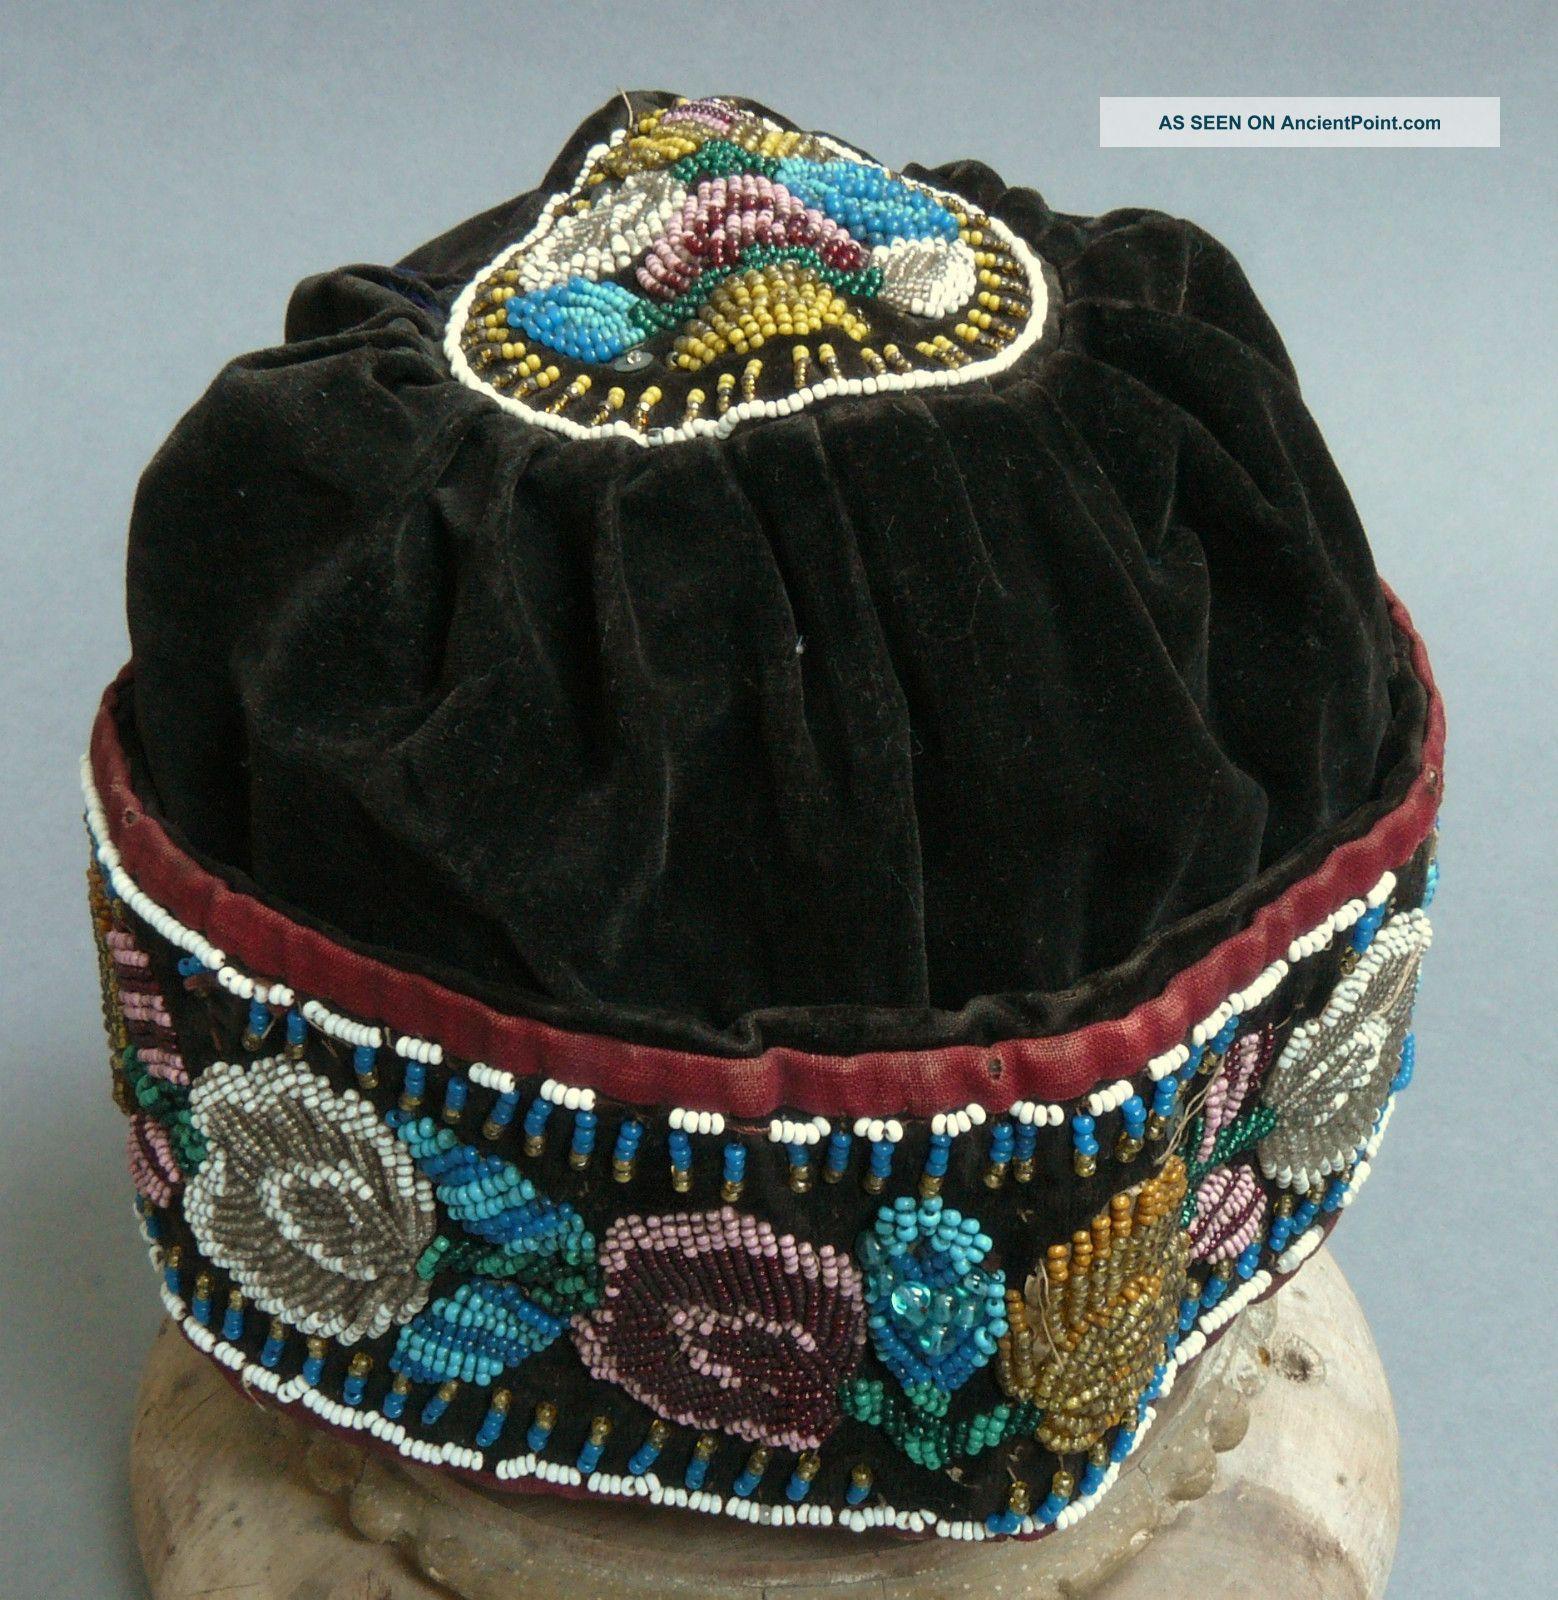 Antique 19c Native American Iroquois Beadwork / Beaded Hat / Cap C1850 - 80 Native American photo